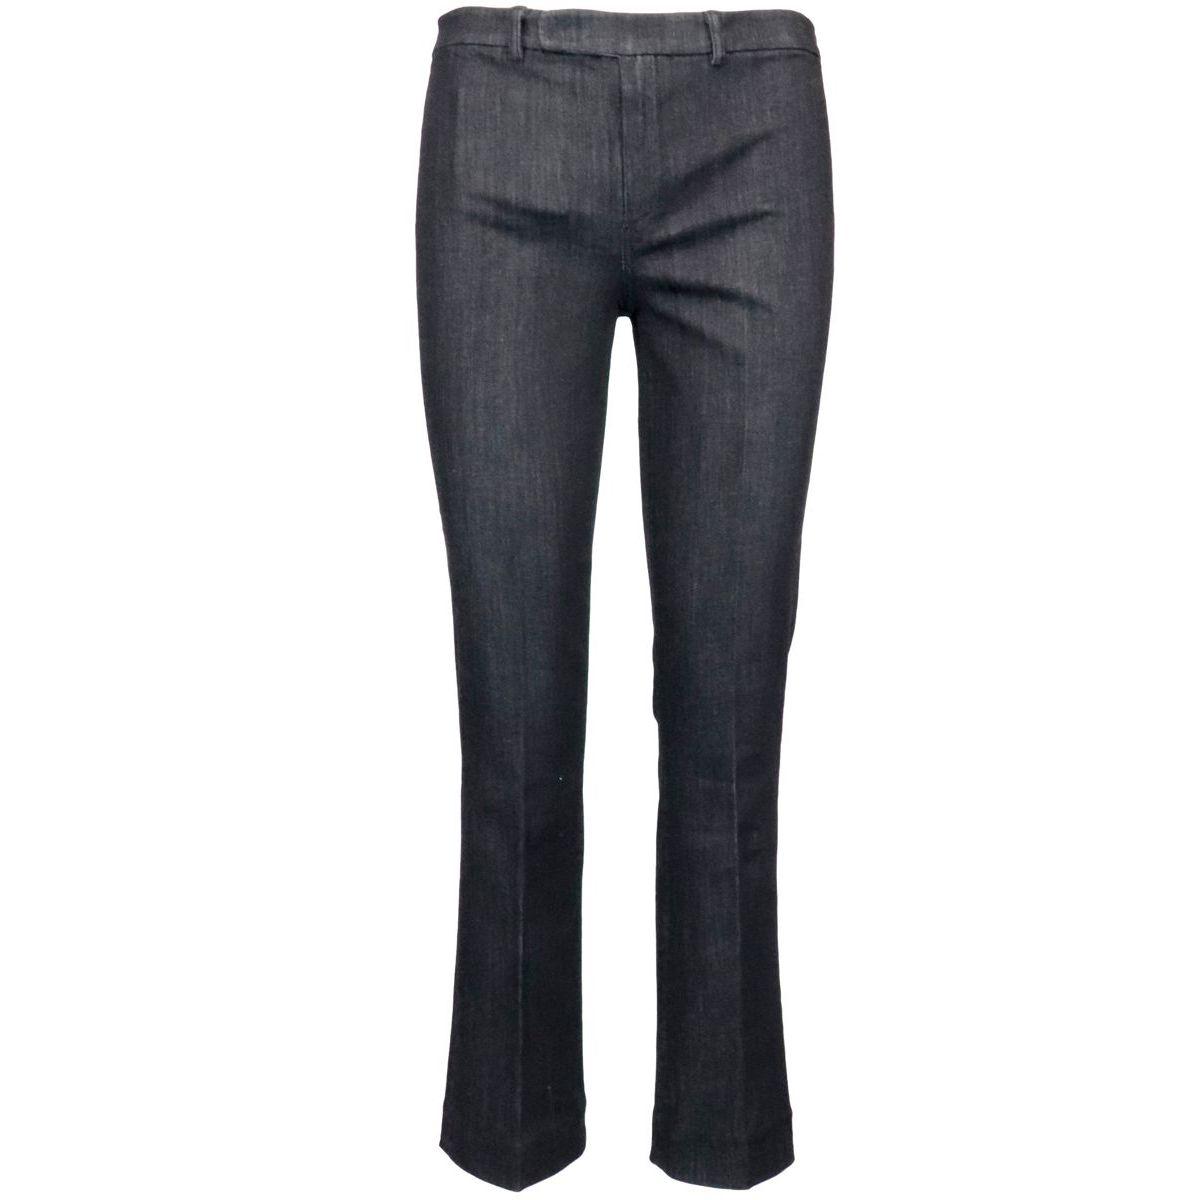 Flared Denimp jeans Anthracite S MAX MARA